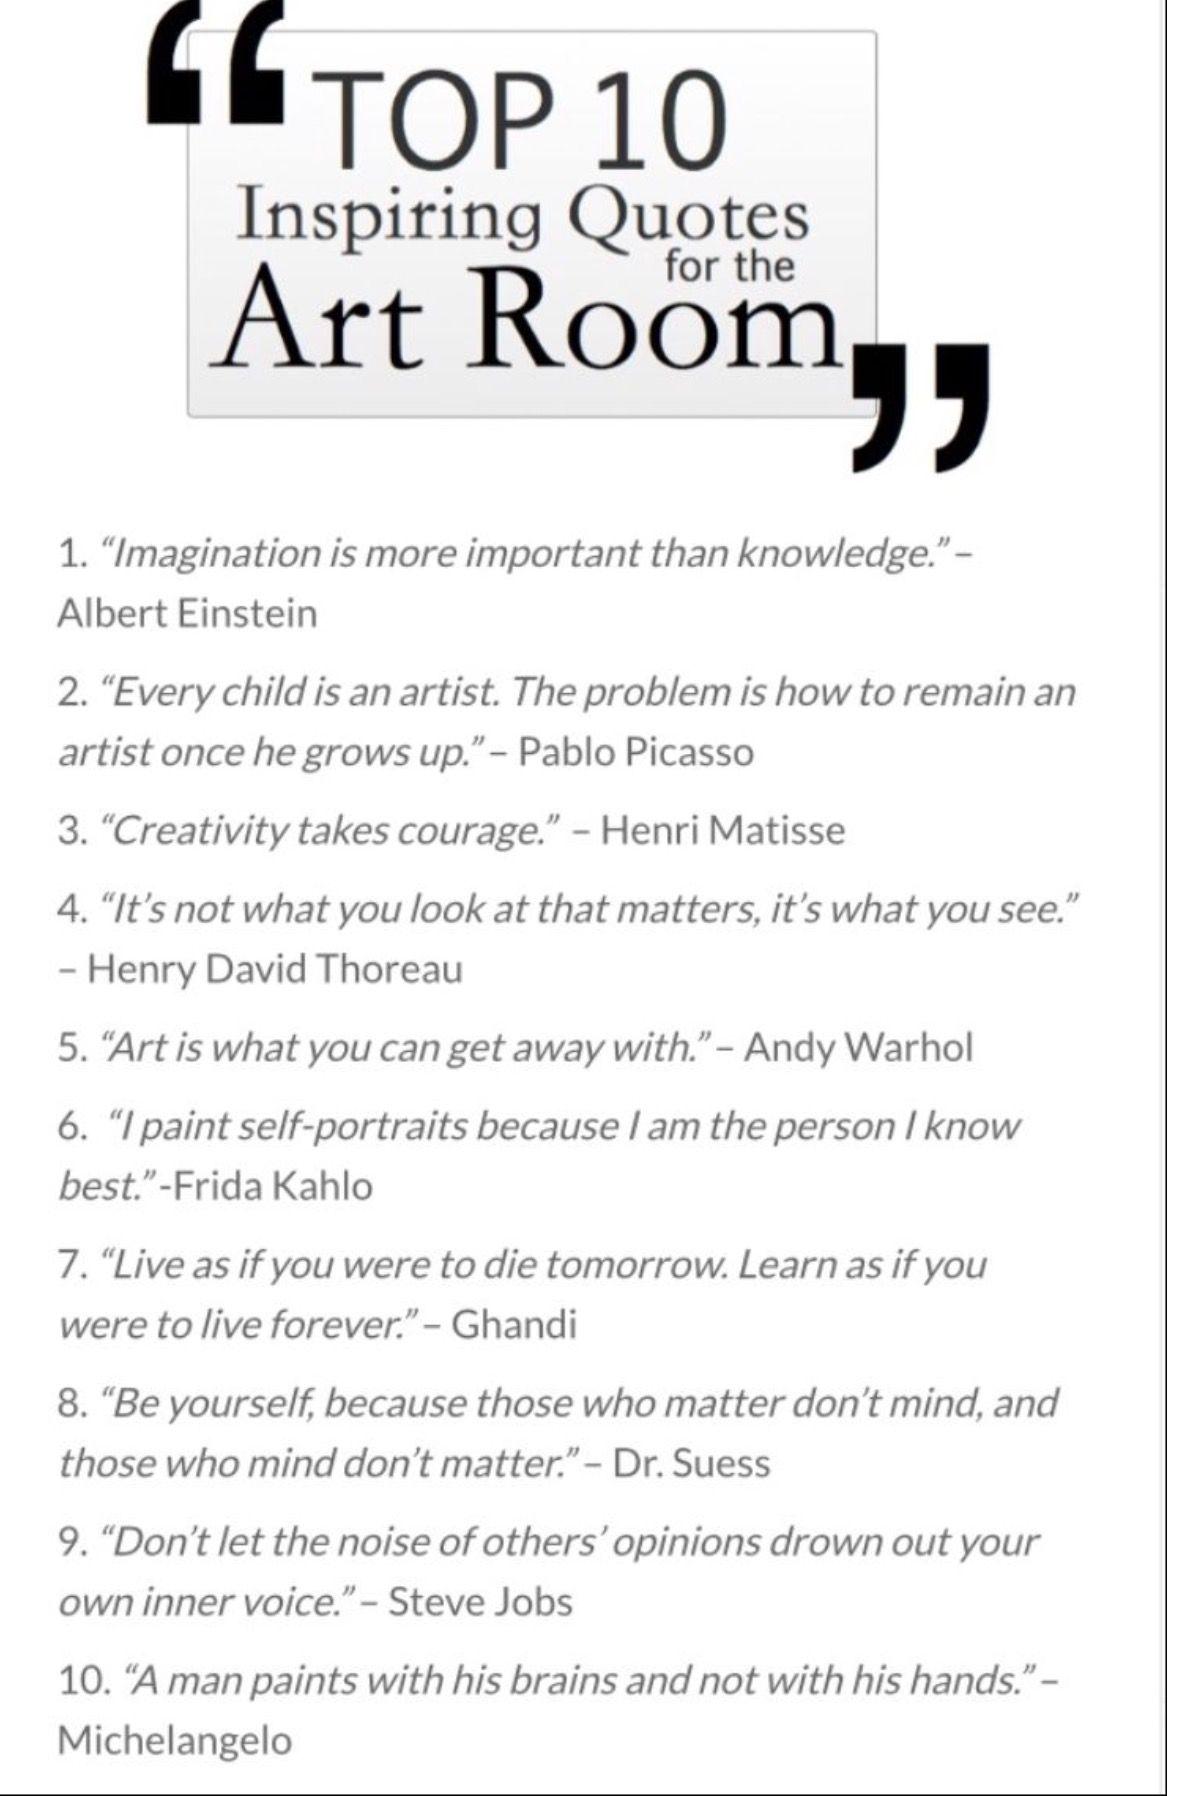 Pin By Krafti Priyanka On Art Quotes Art Room Posters Art Room Words Arts live education room